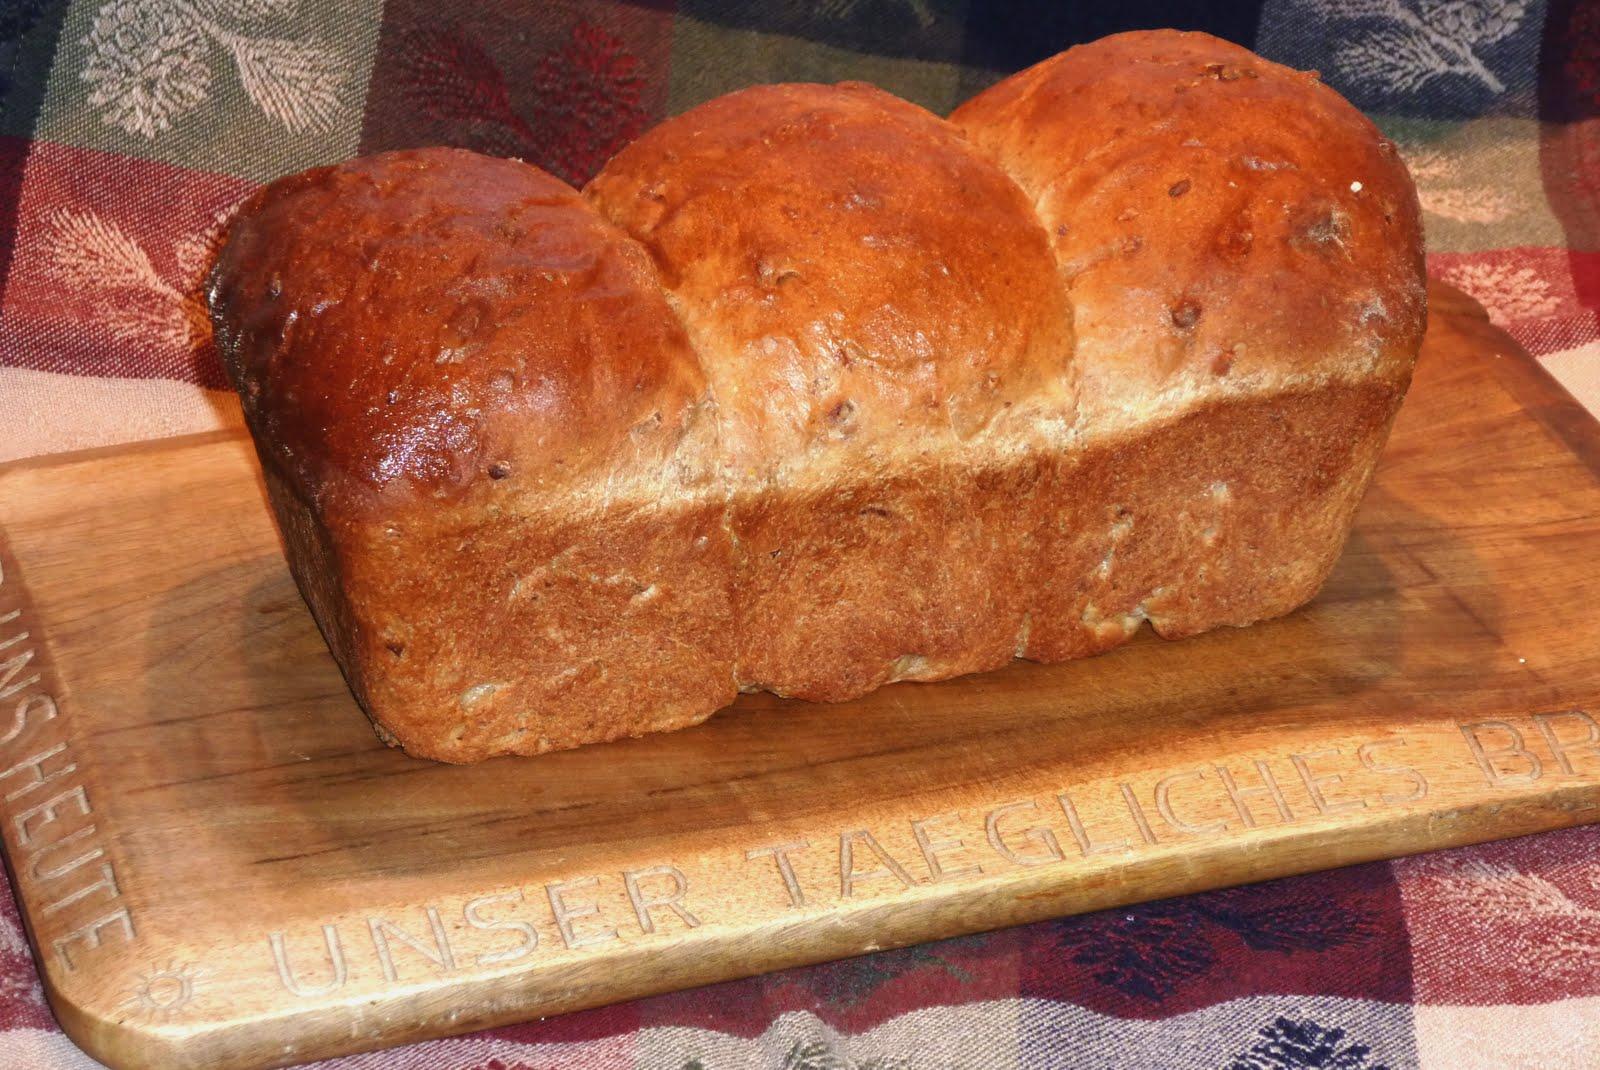 The Iowa Housewife: Nutty Orange Wheat Bread